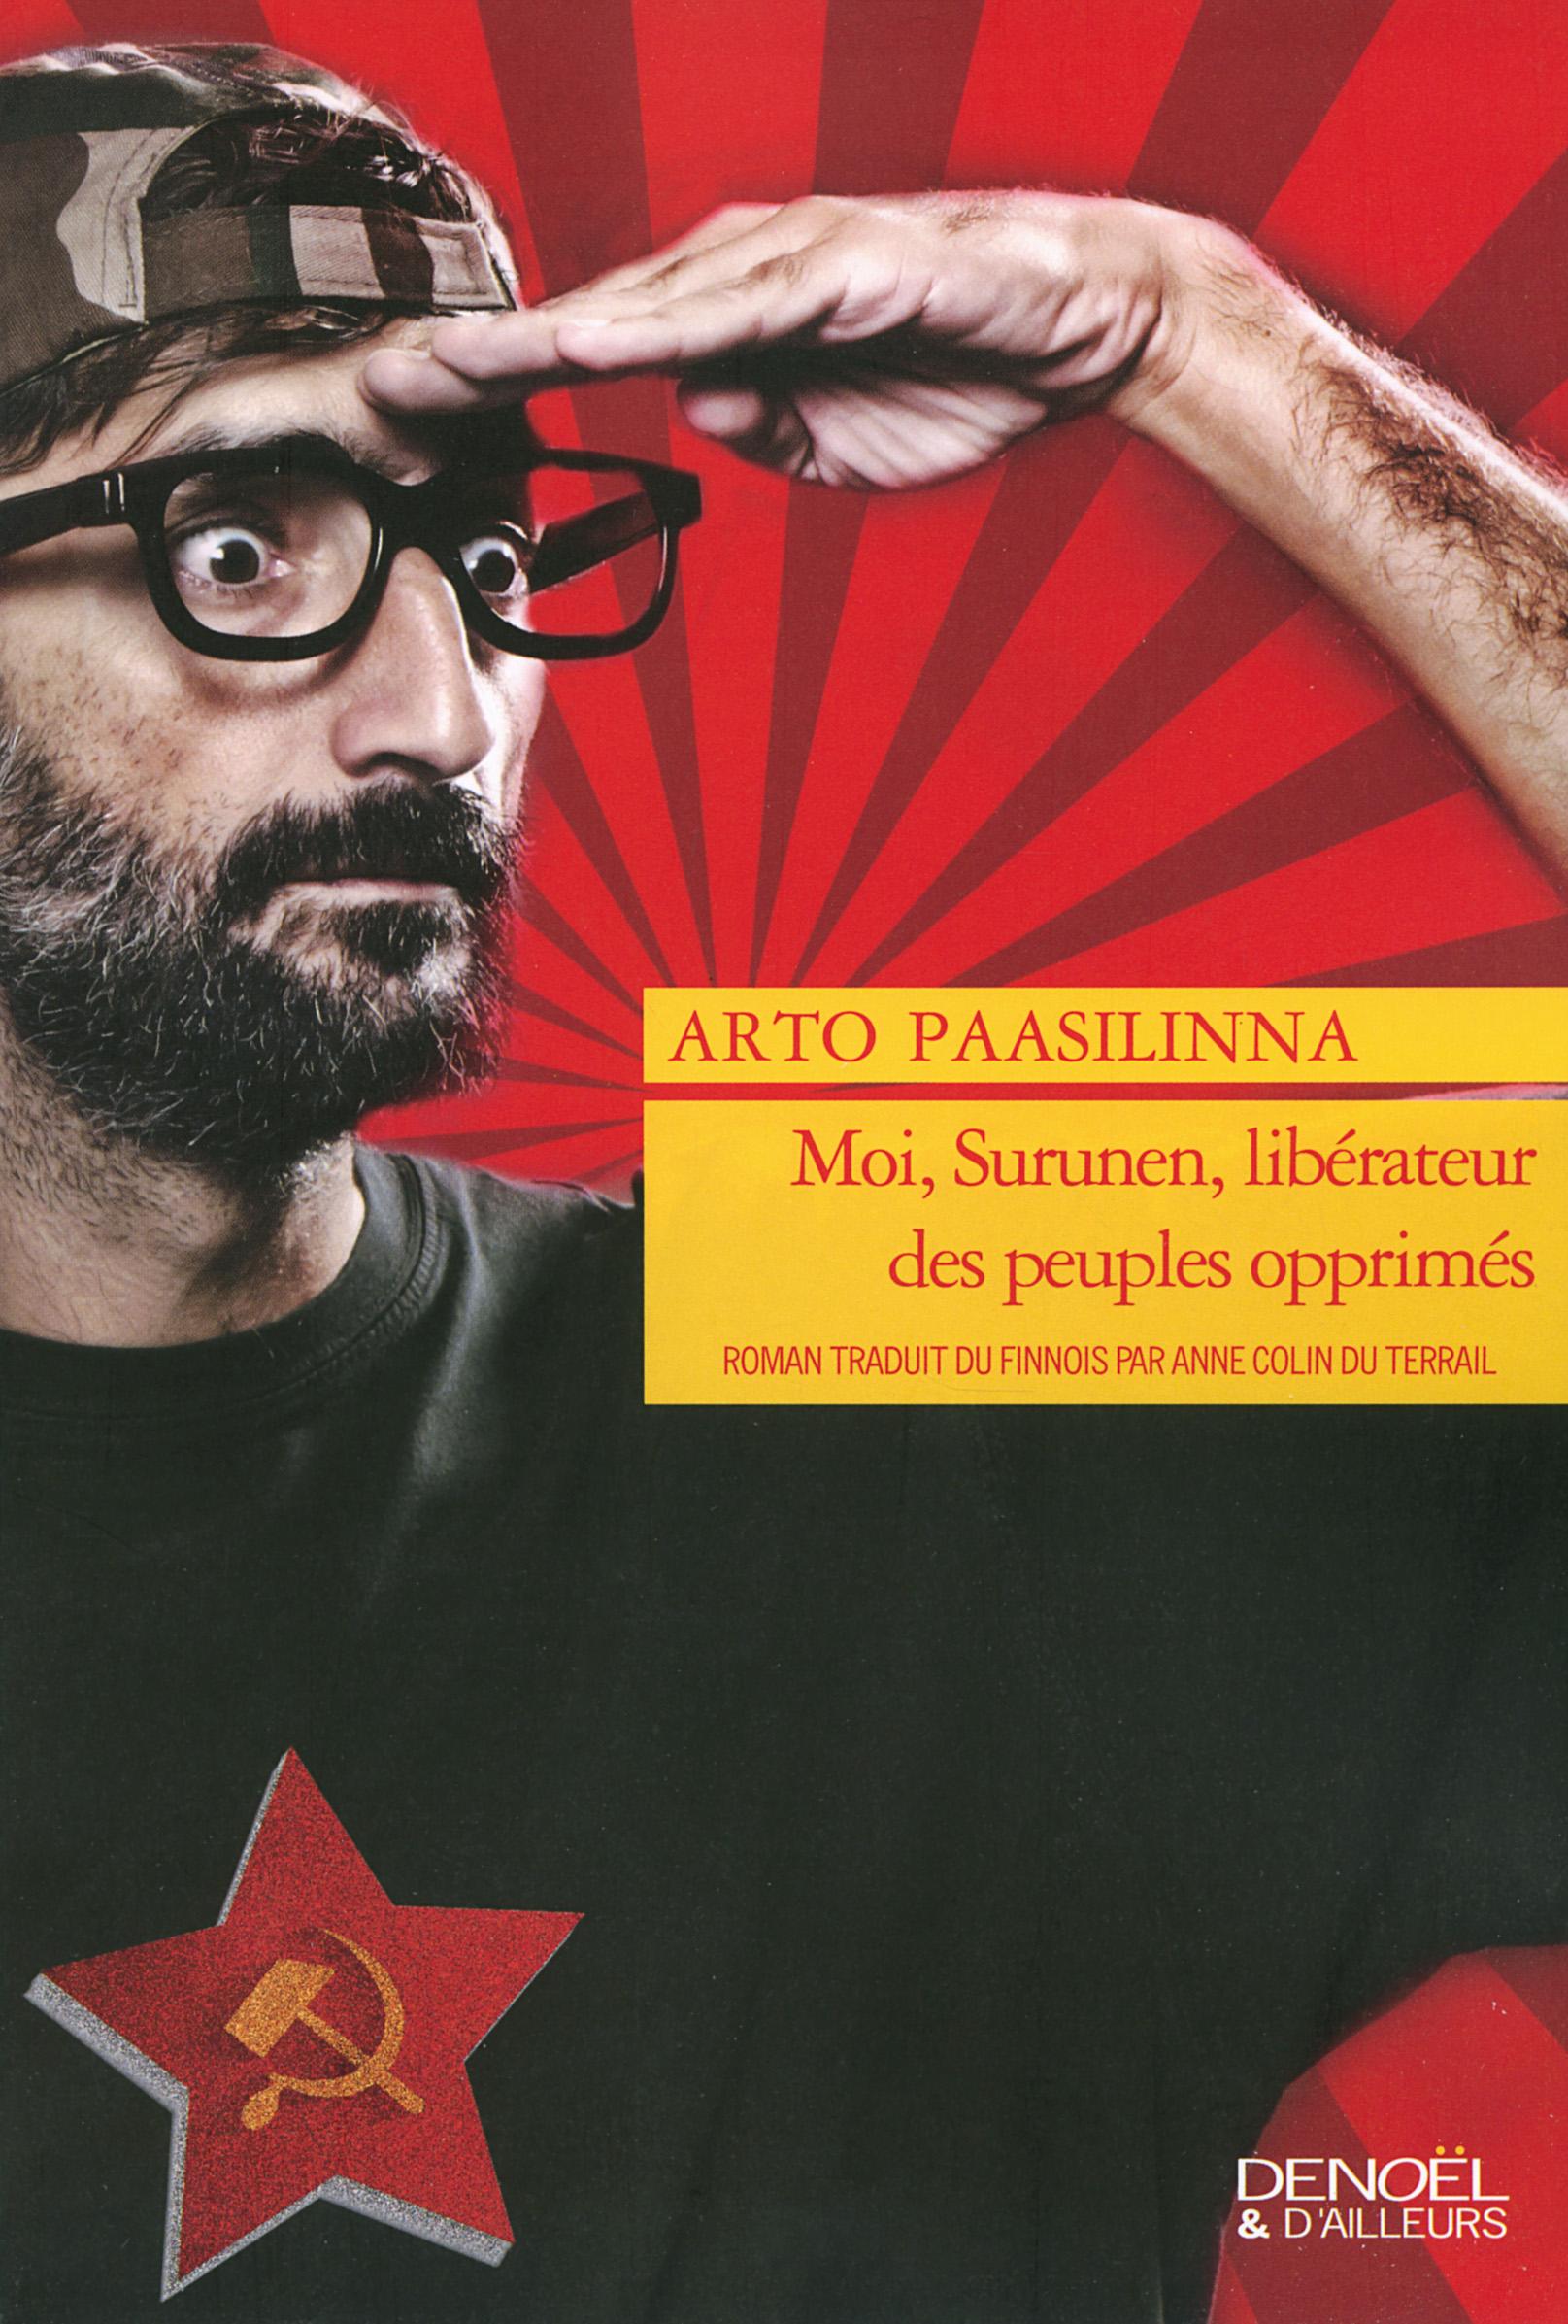 Moi, Surunen, libérateur des peuples opprimés | Paasilinna, Arto